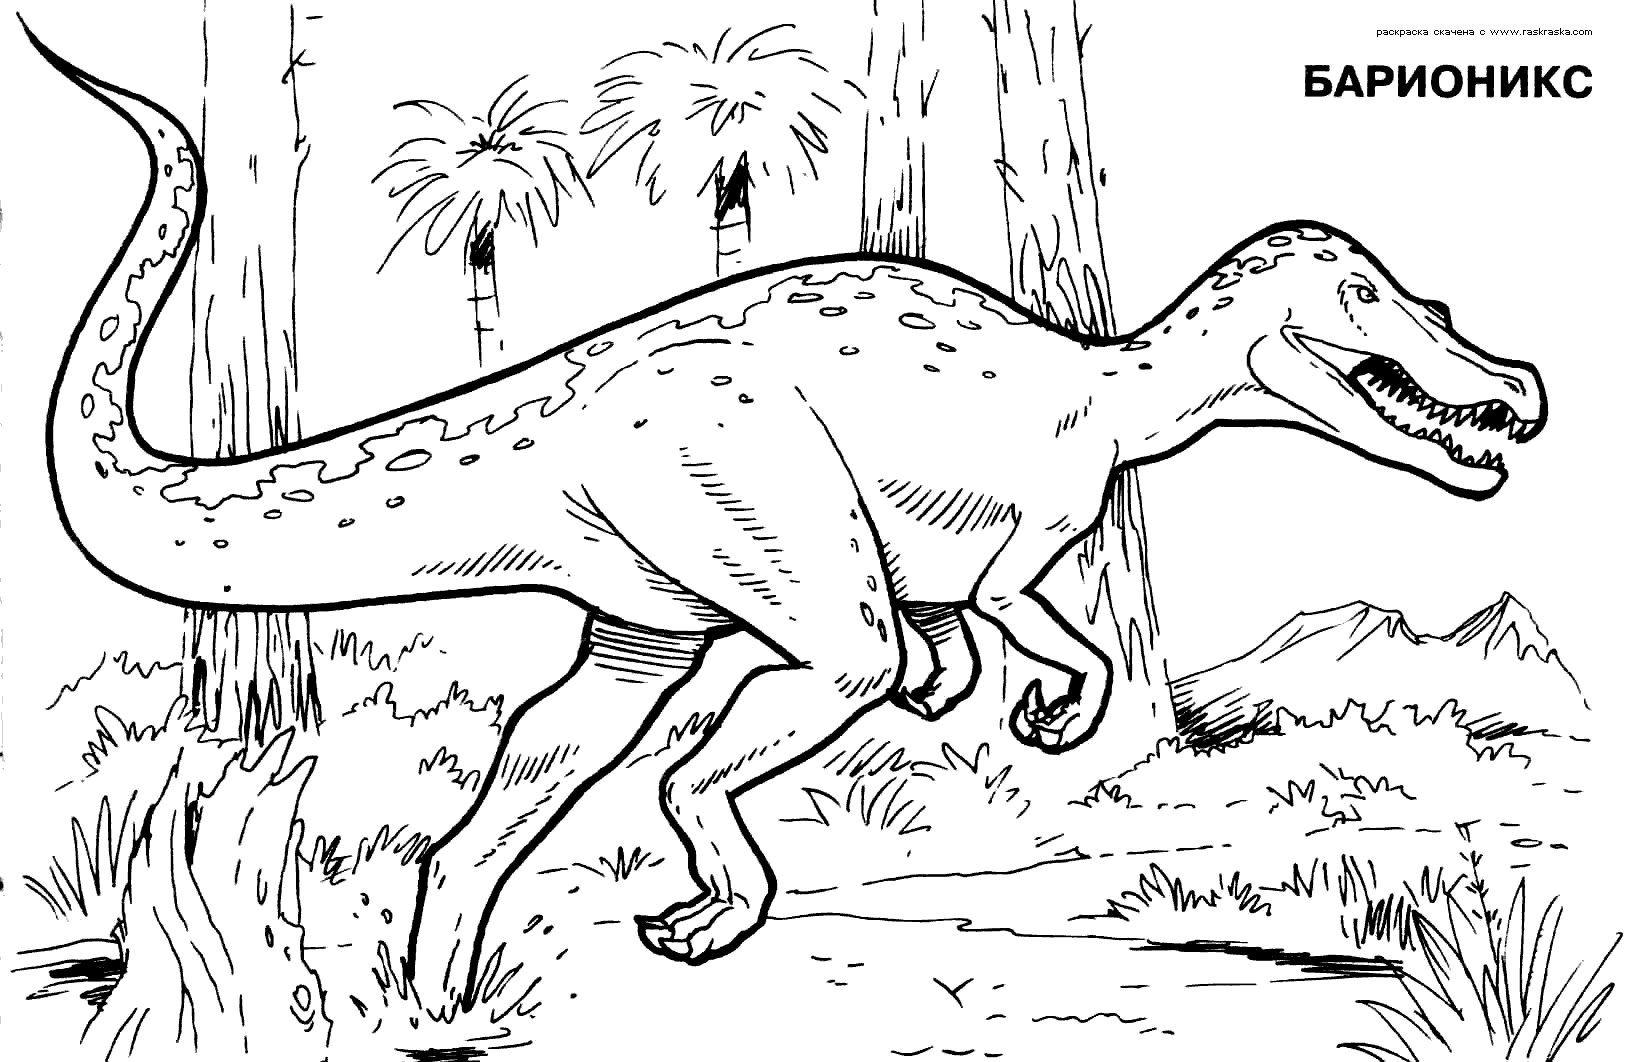 Vaizdo Rezultatas Pagal Uzklausa Dinozaurai Spalvinti Dinosaur Coloring Pages Dinosaur Coloring Free Coloring Pages